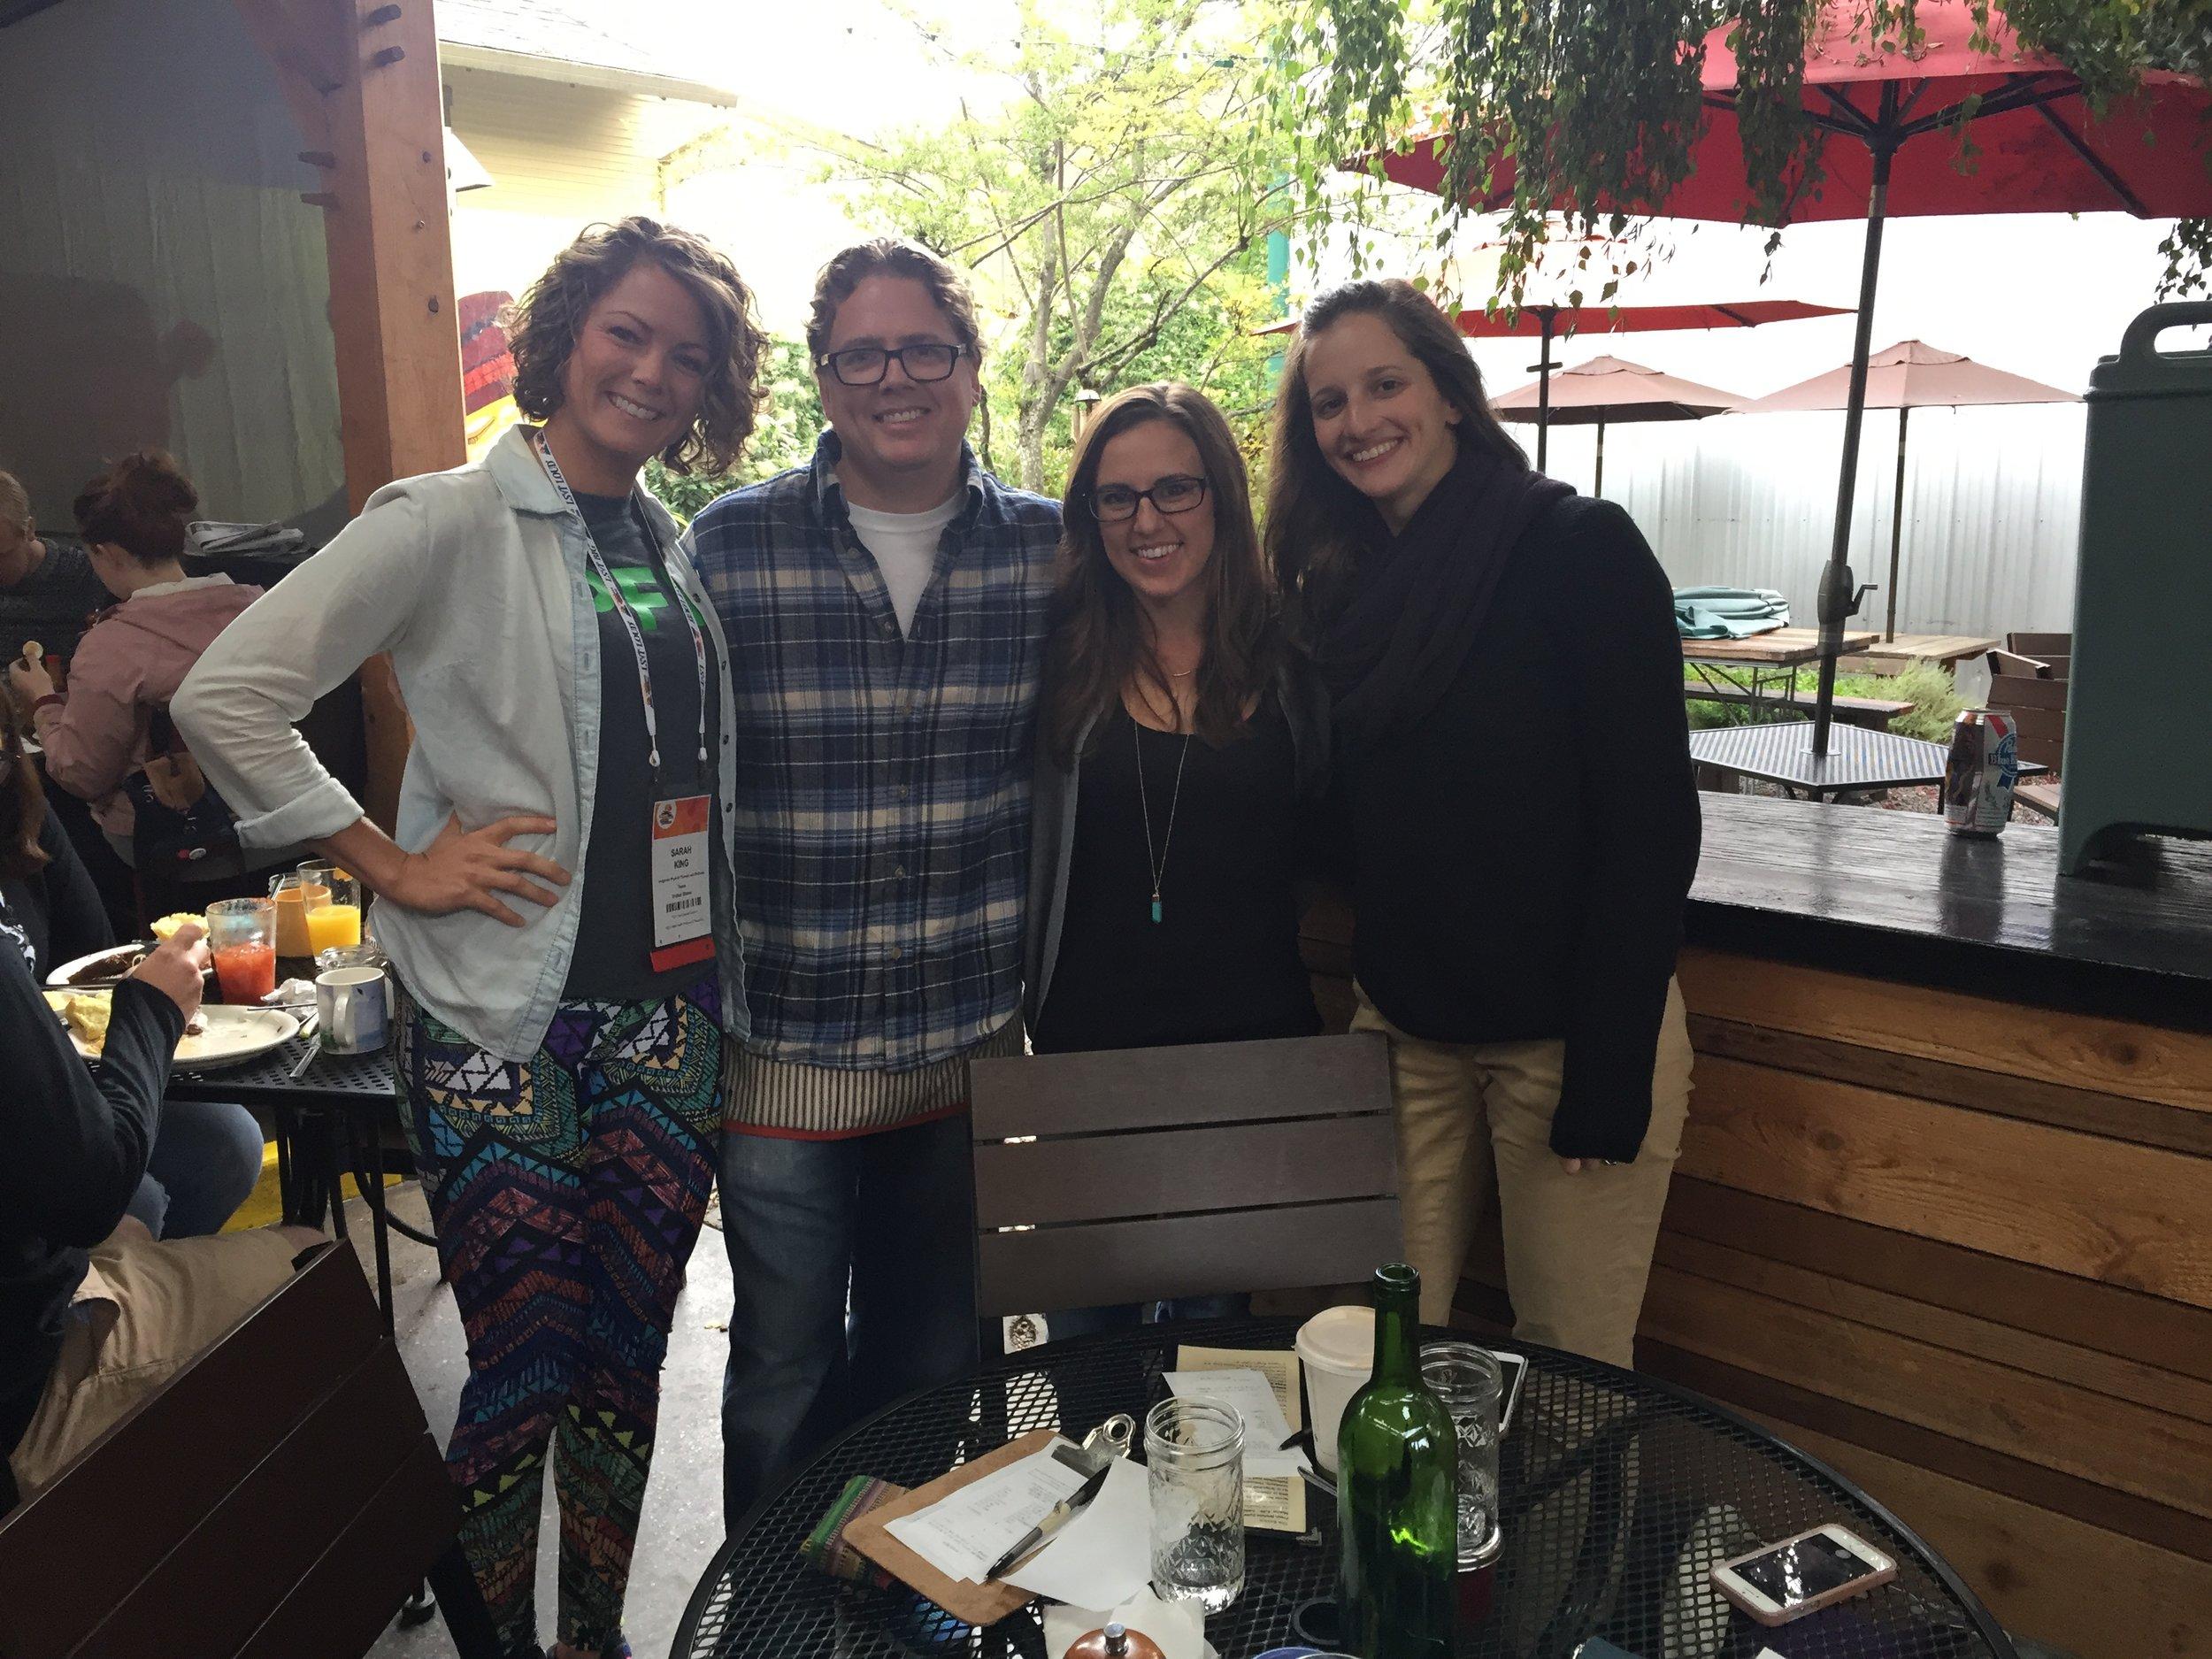 Grabbing breakfast with PD PTs Jennifer Anderson (Root PT) and Naomi Casiro (NeuroFitBC)